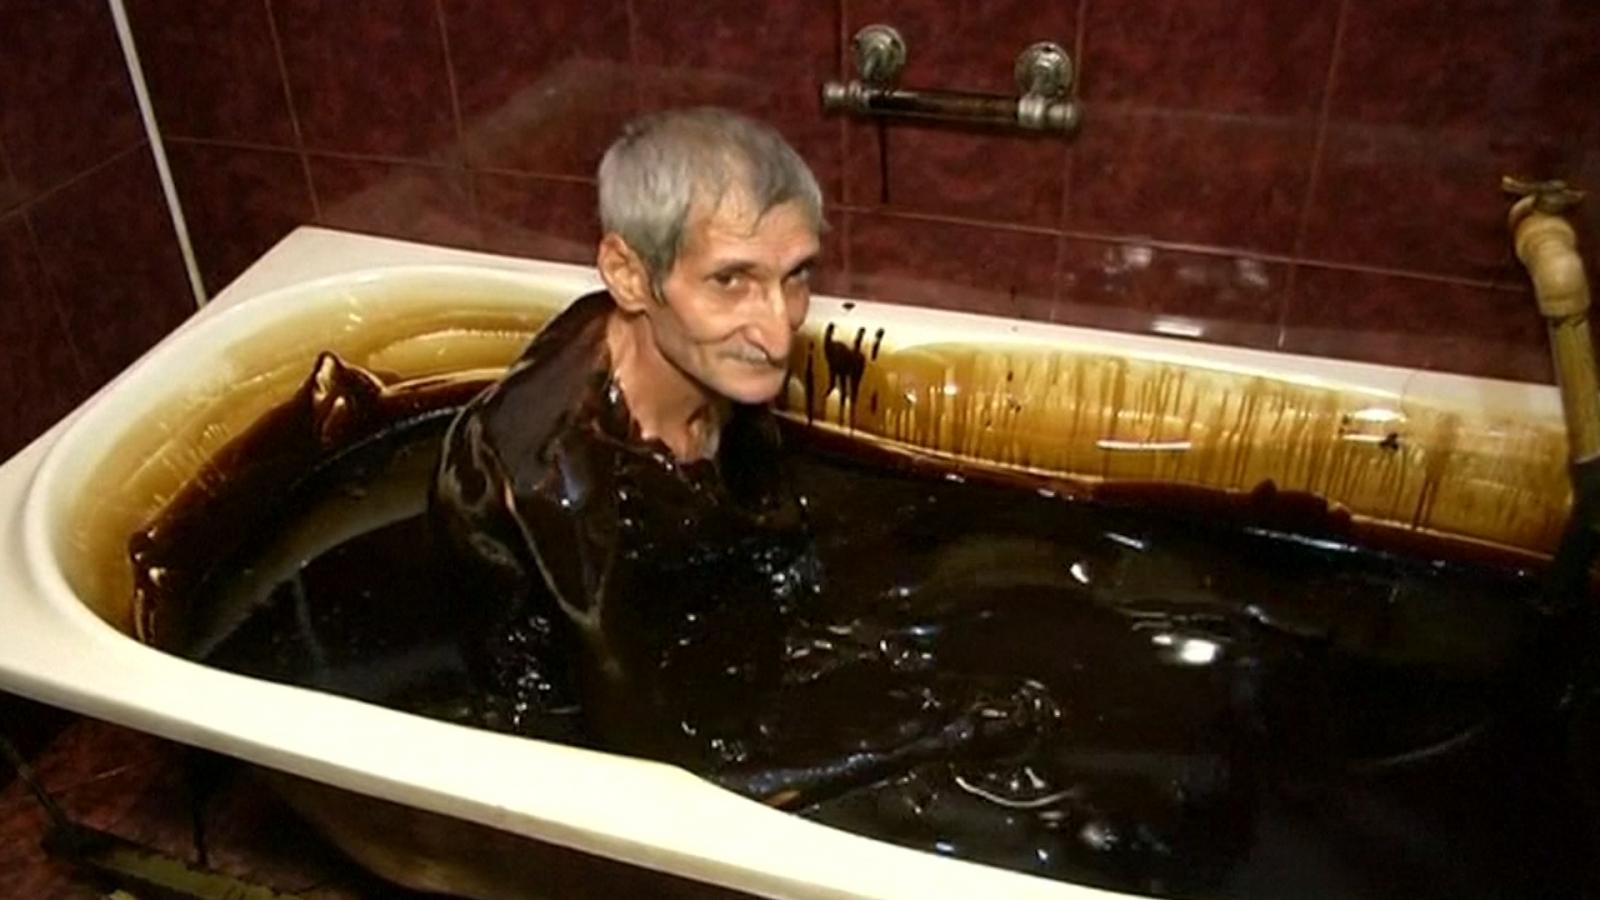 azerbaijan luxury spa lets its customers take a bath in